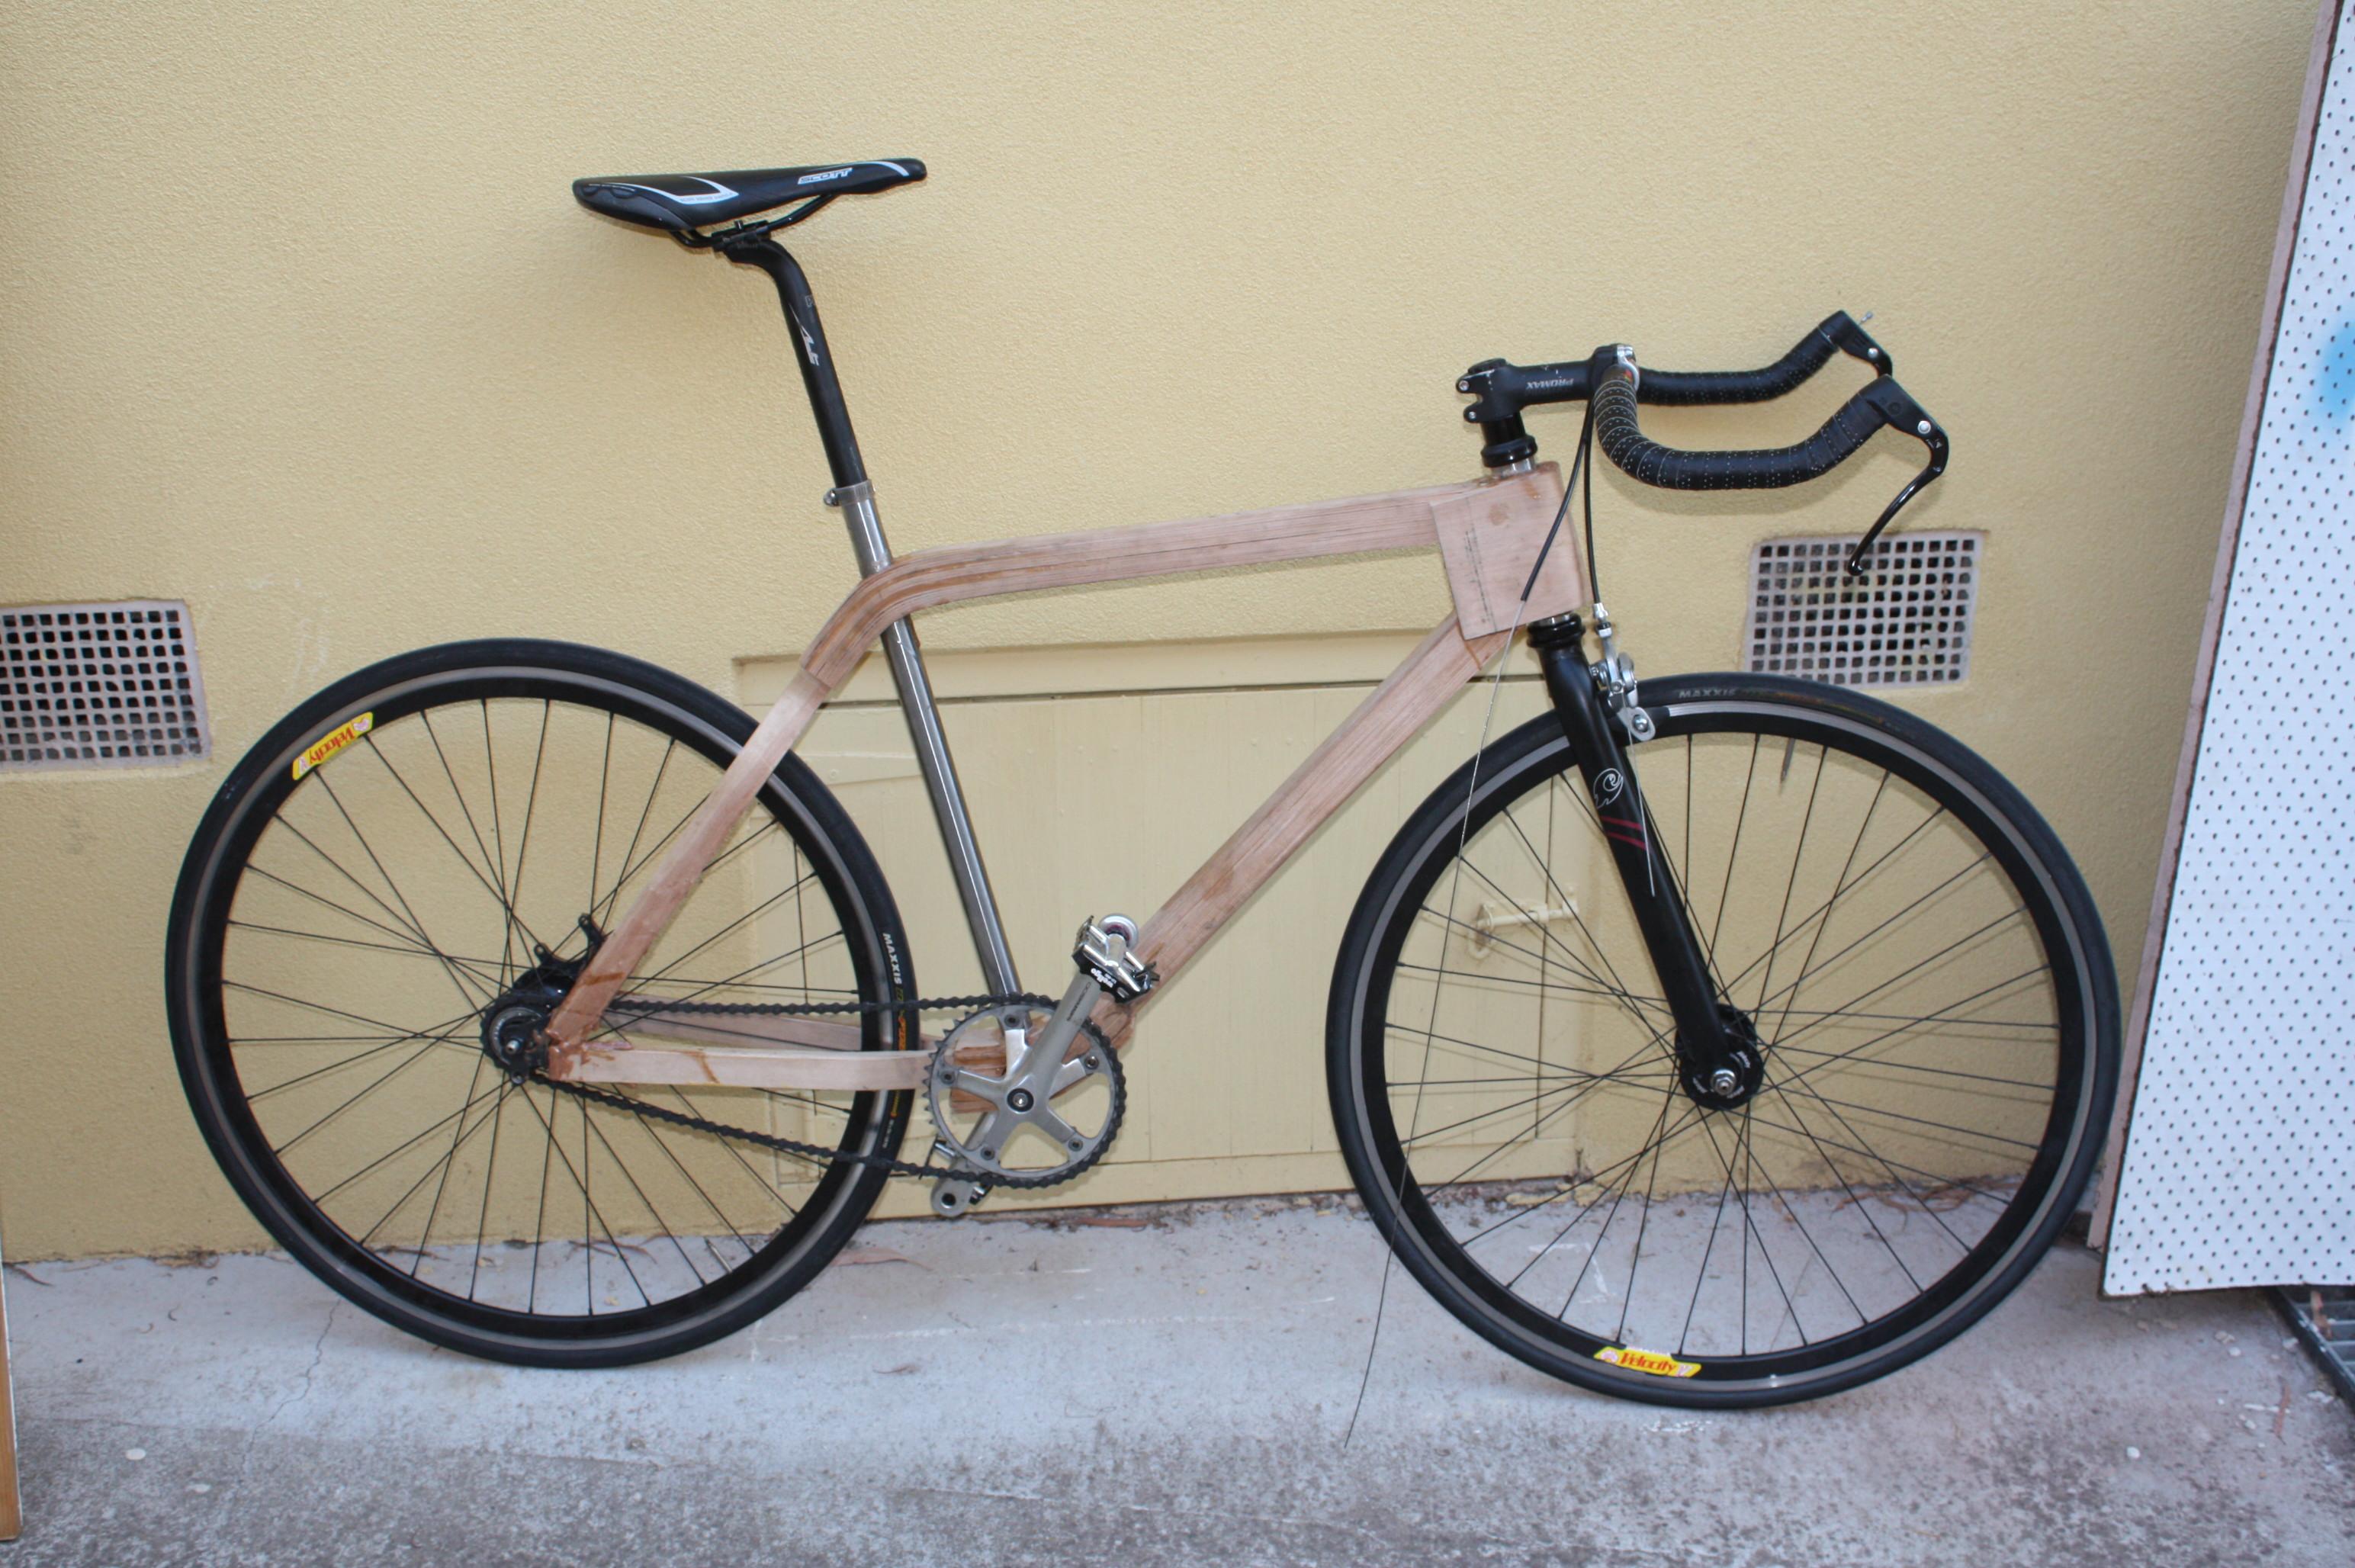 advertisements - Wooden Bike Frame